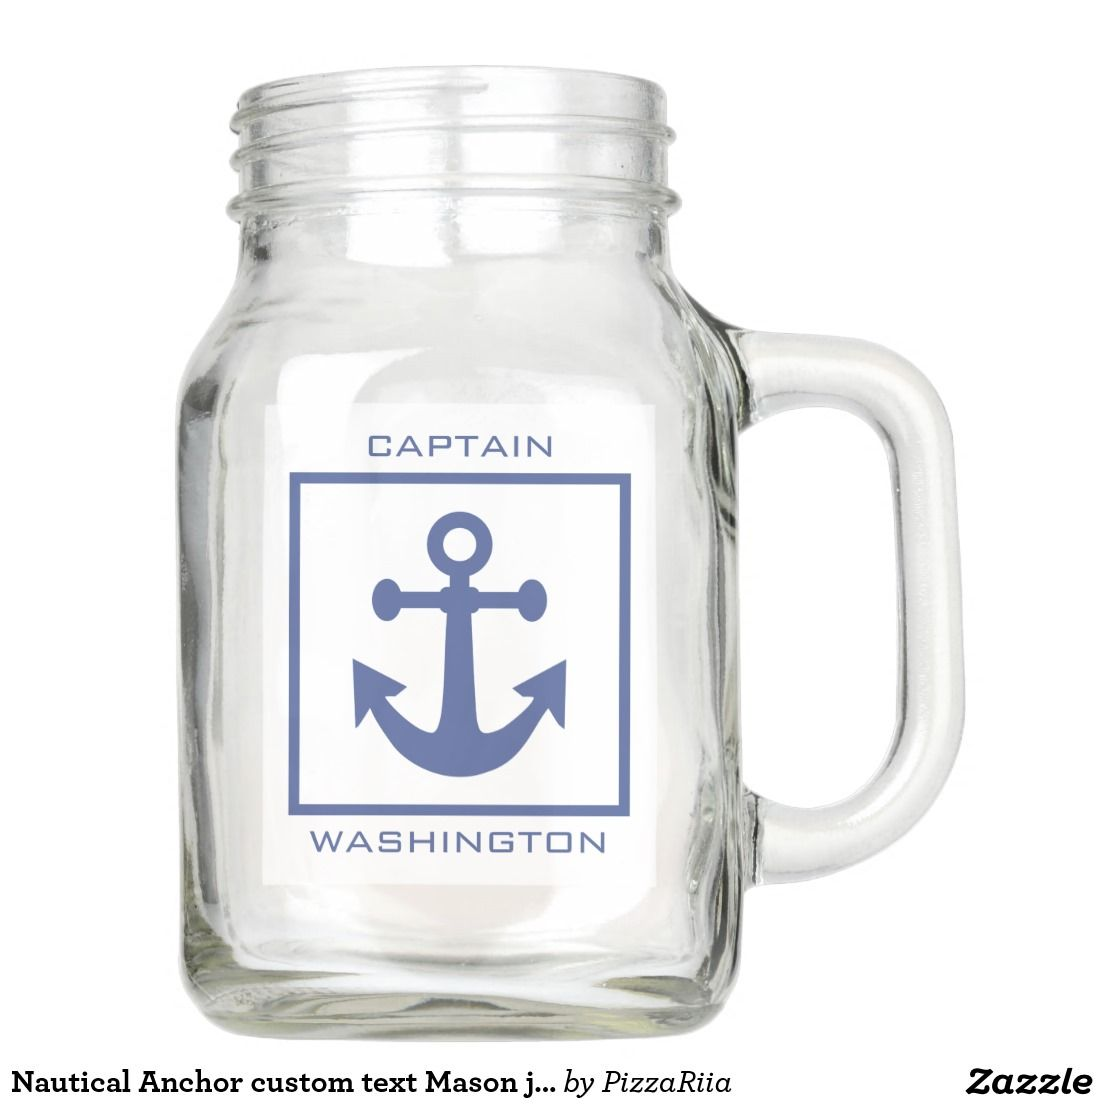 Nautical Anchor custom text Mason jars Mason Jar | Mason Jars ...